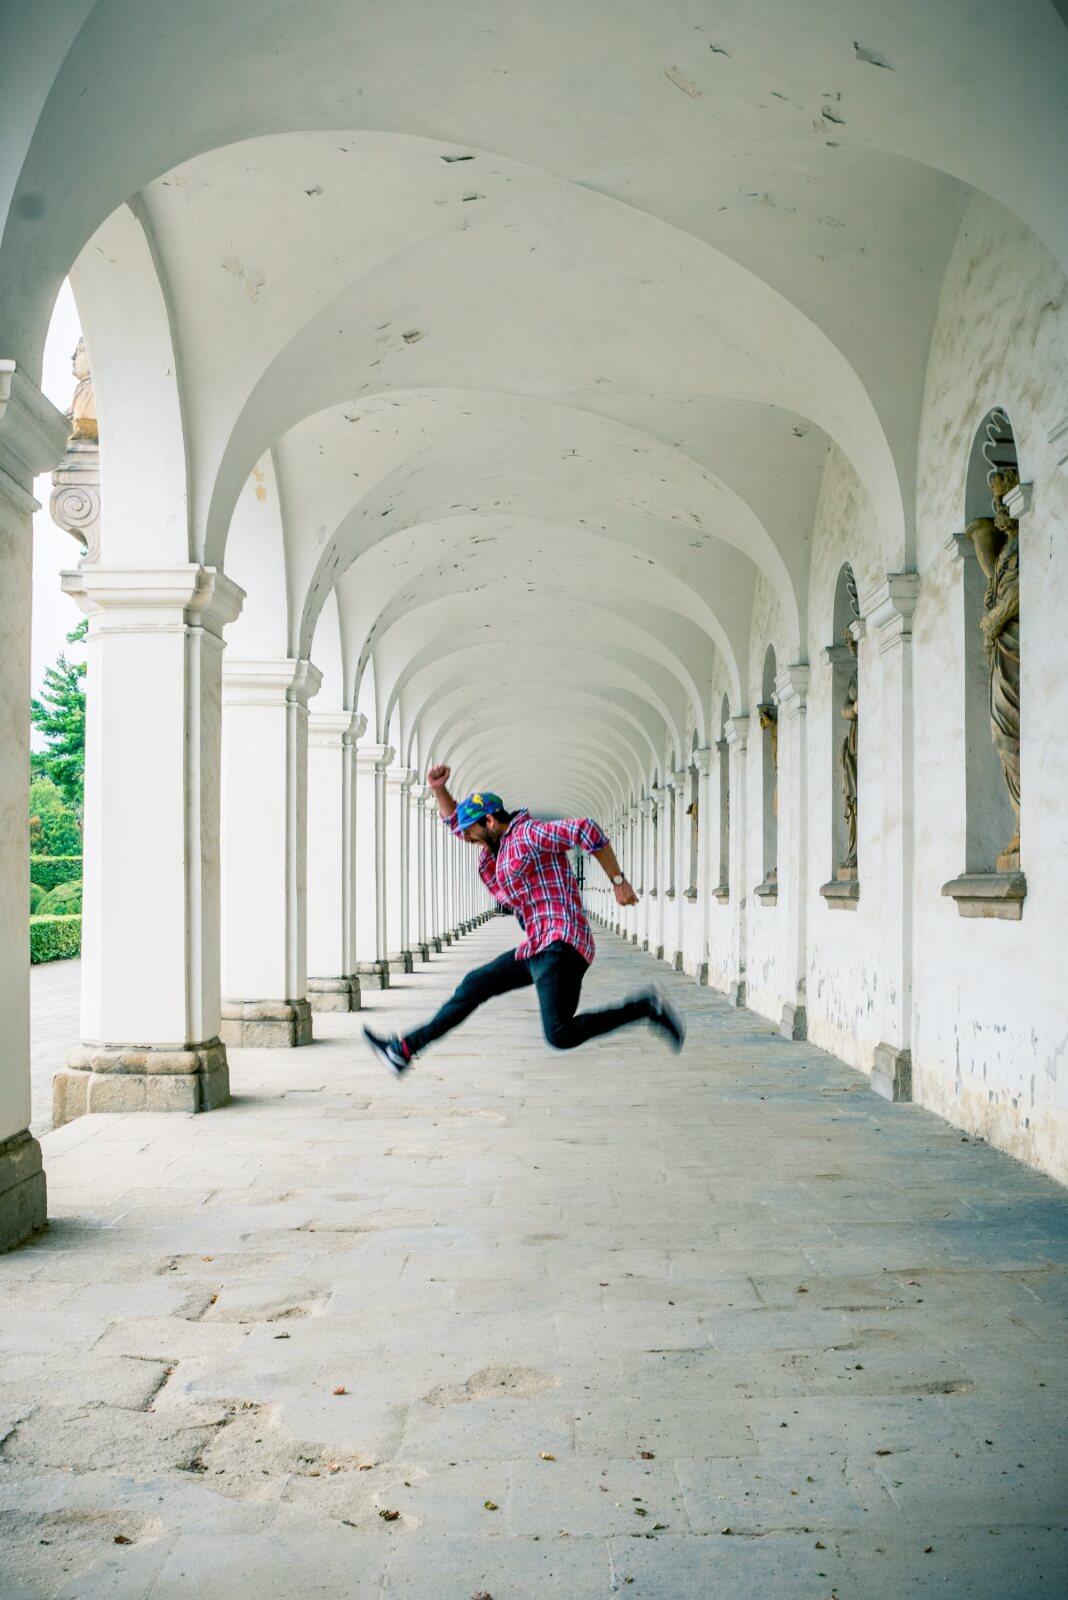 Scott jumping in the colonnade in the Castle gardens of Kromeriz